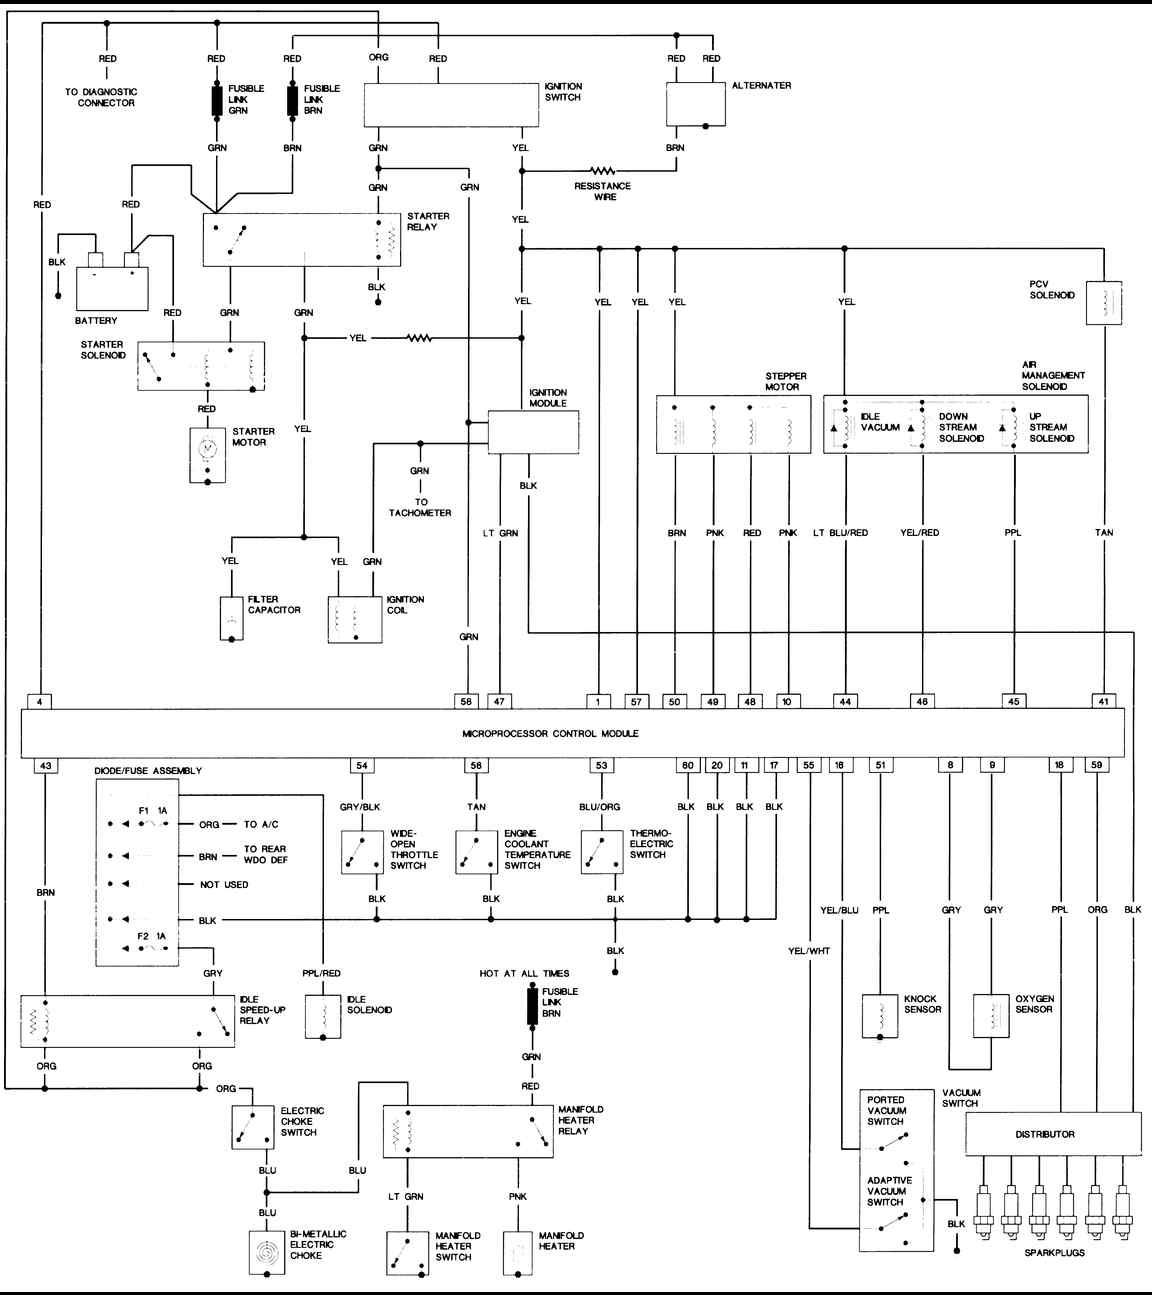 jeep wrangler engine wiring harness diagram   index wiring diagrams outgive  wiring diagram library